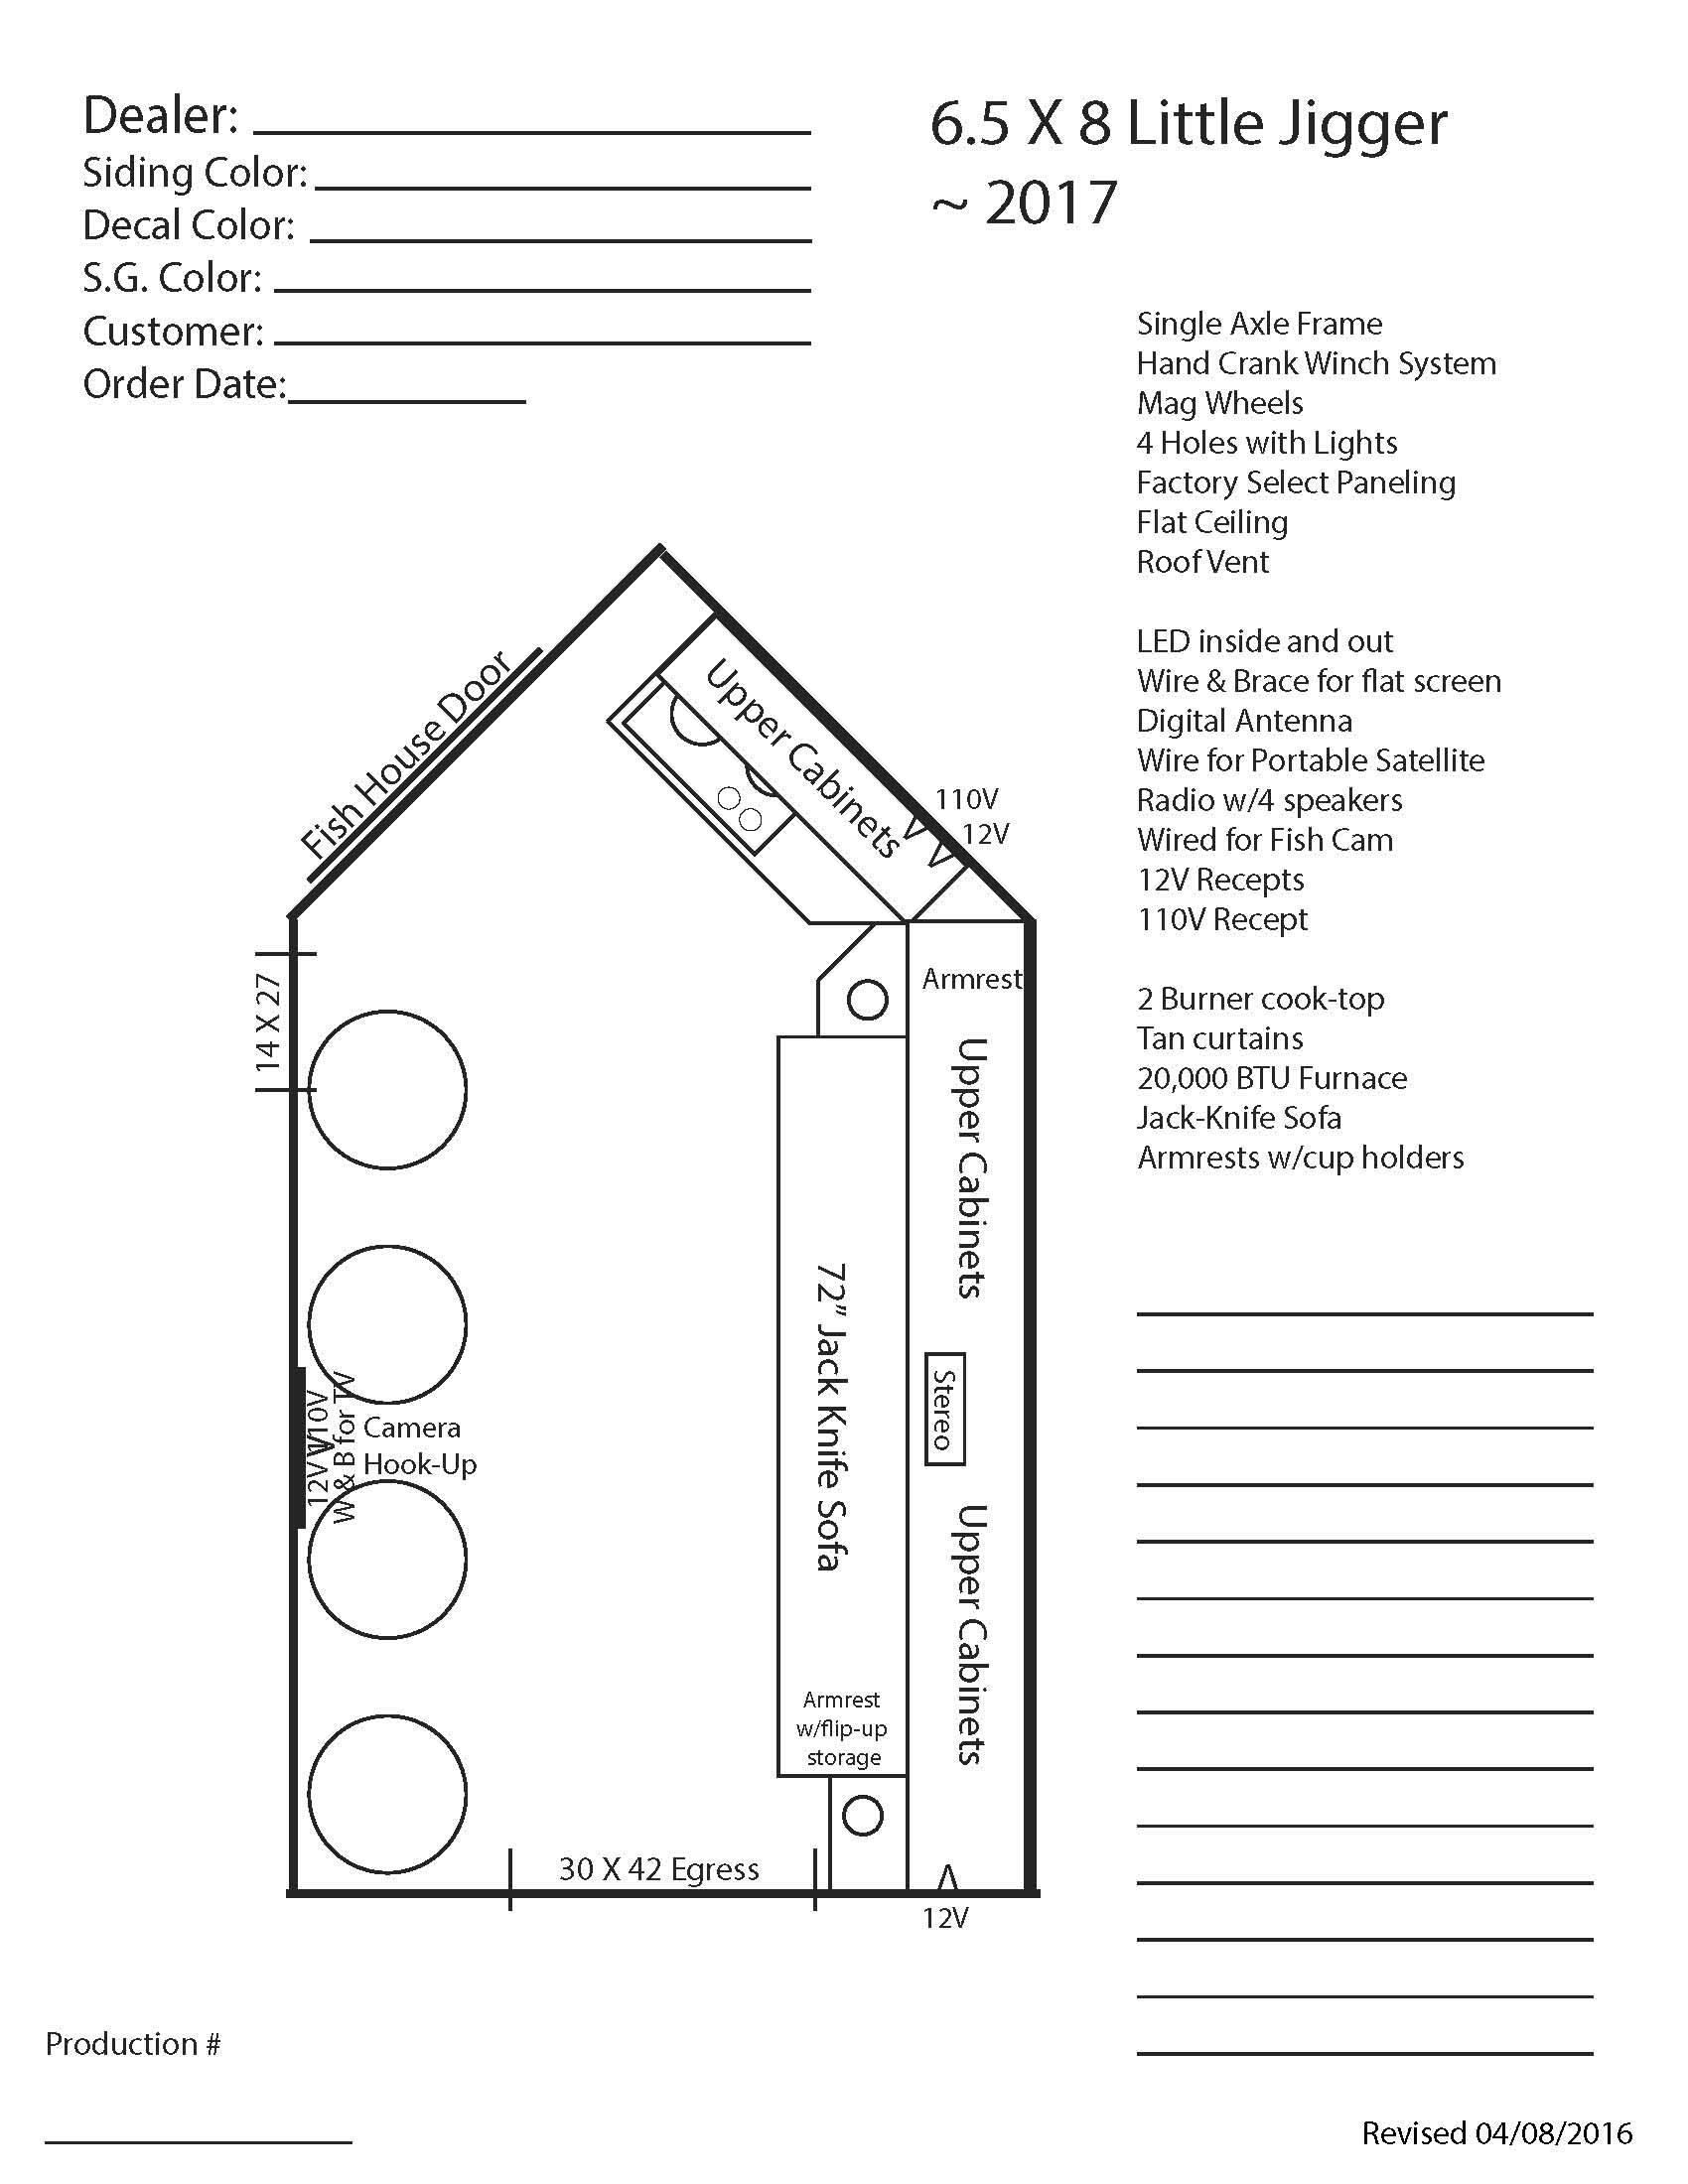 1956 thunderbird wiring diagram pdf 1959 corvette wiring